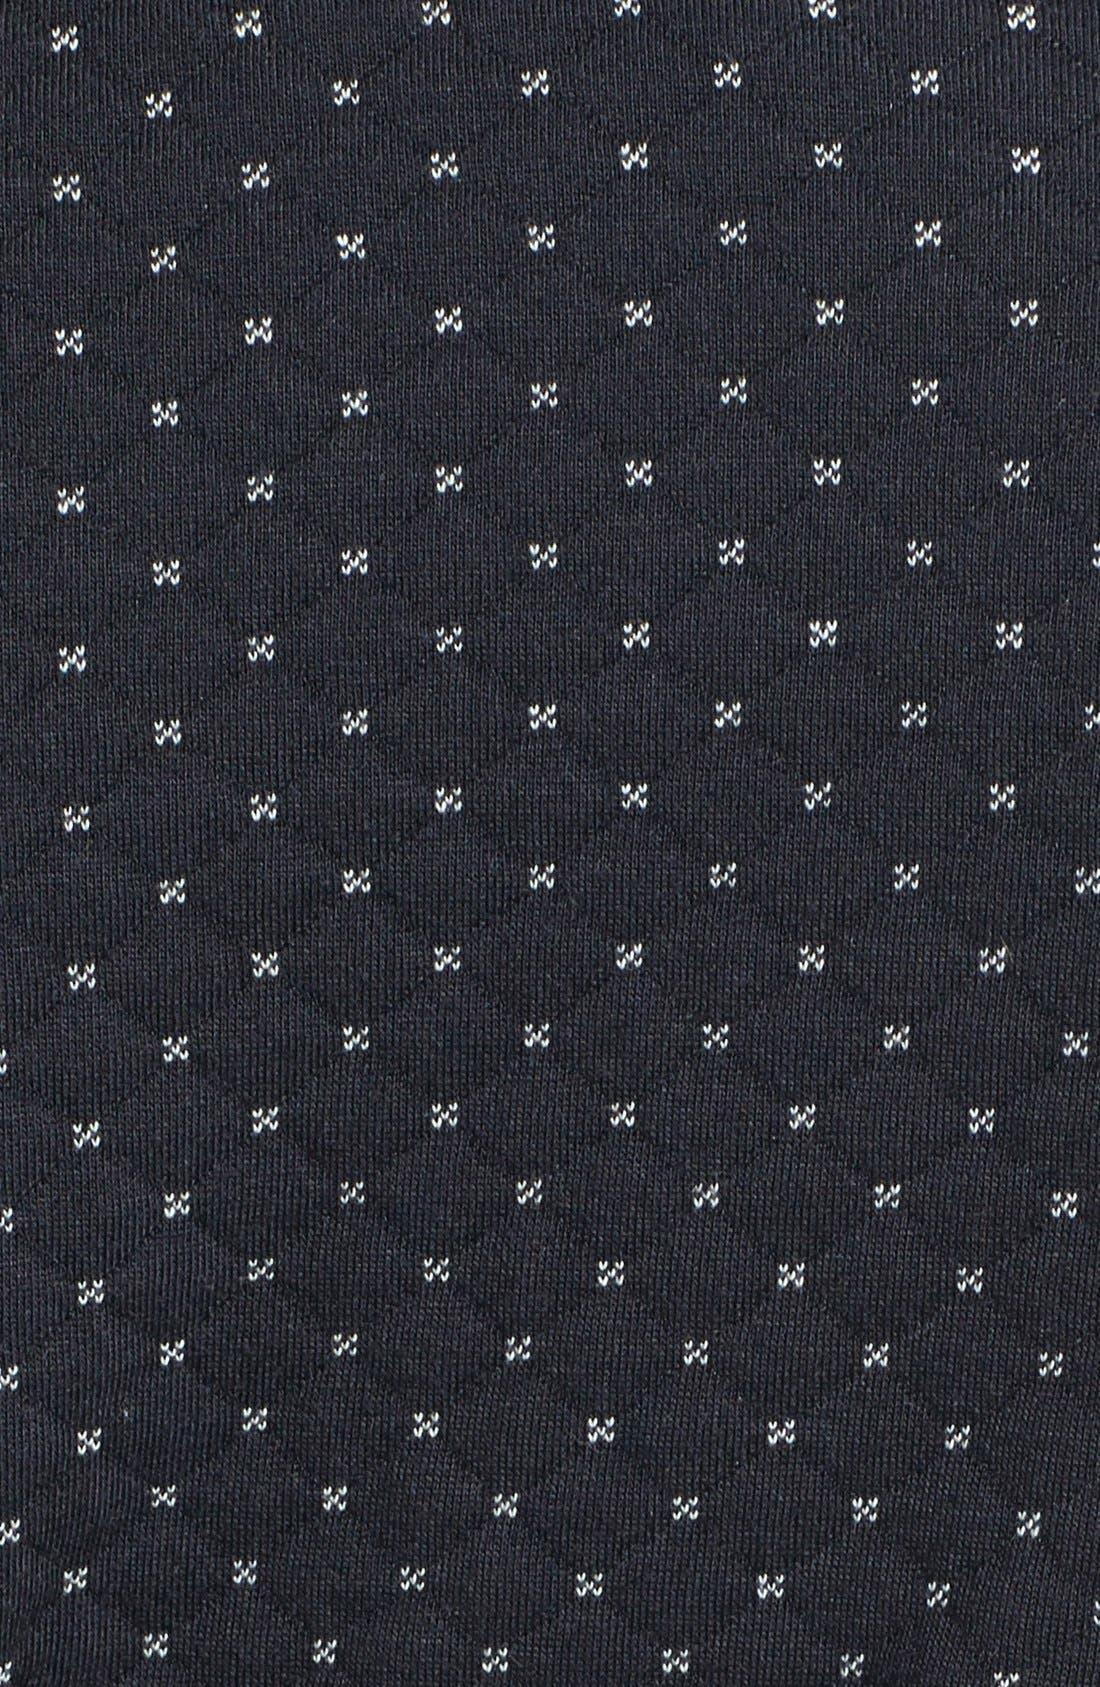 Alternate Image 3  - Caslon® Quilted Print Knit Jacket (Petite)